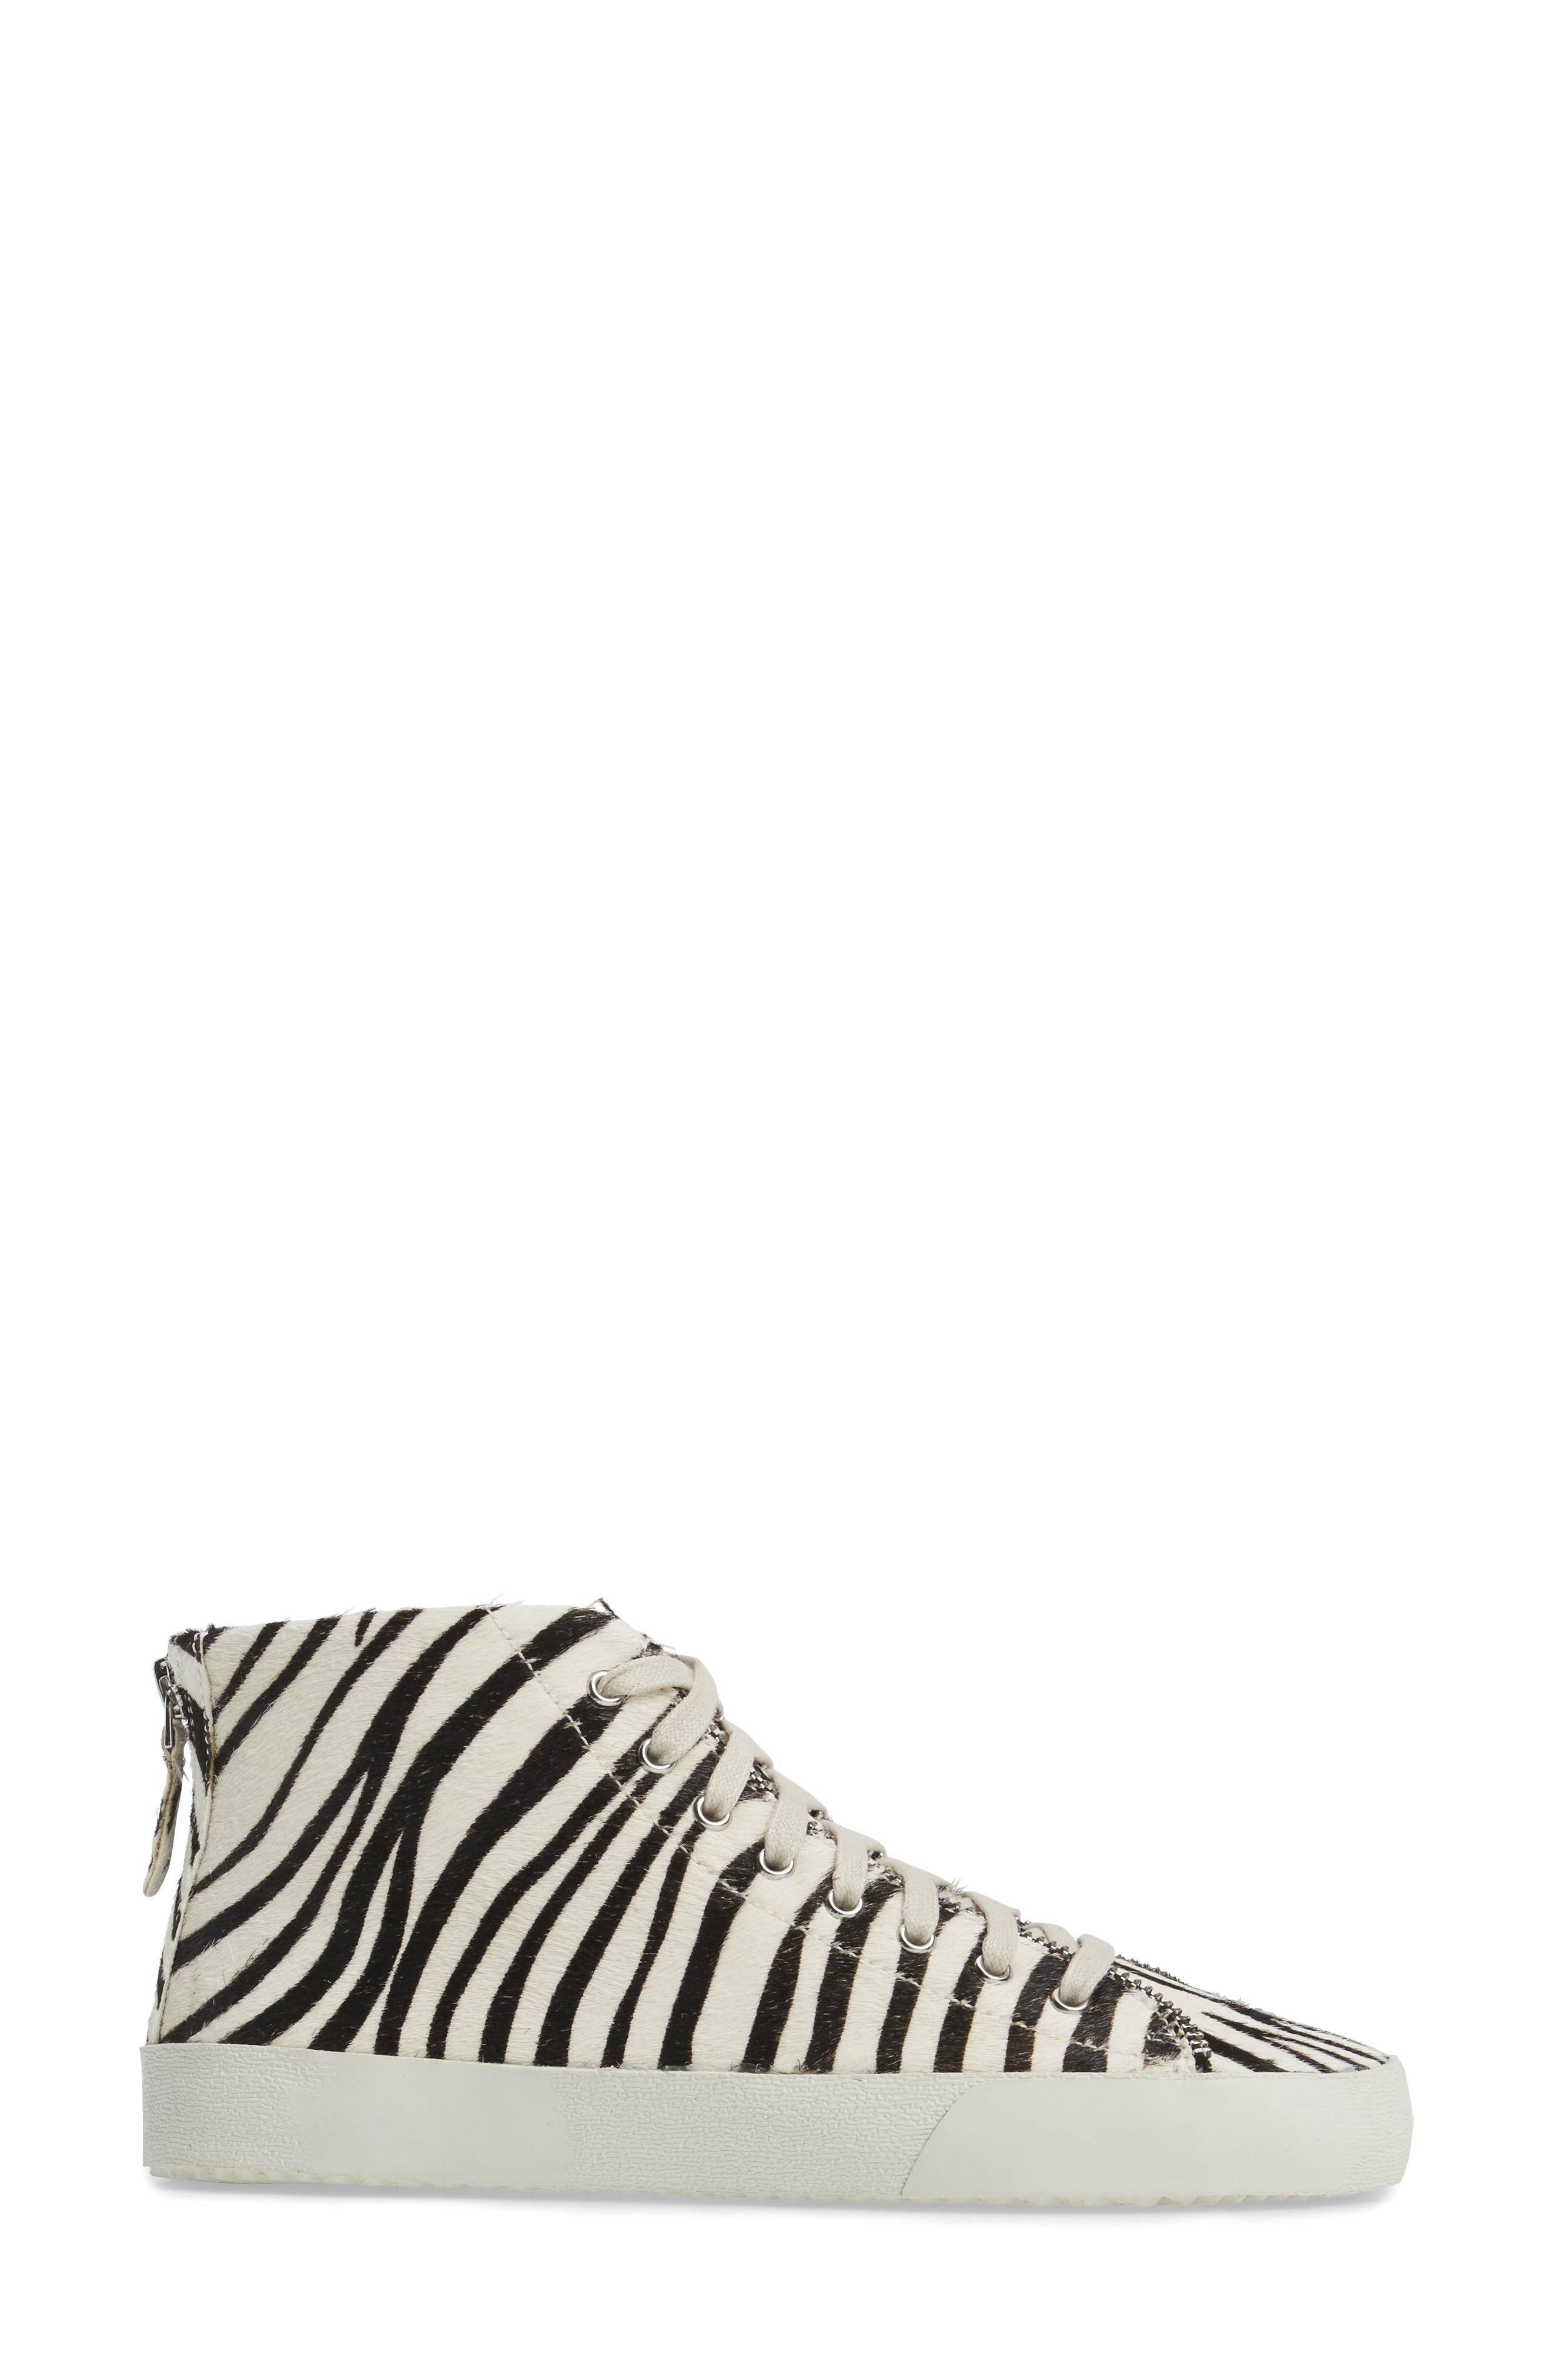 Alternate Image 3  - Rebecca Minkoff Zaina Too Genuine Calf Hair Sneaker (Women)